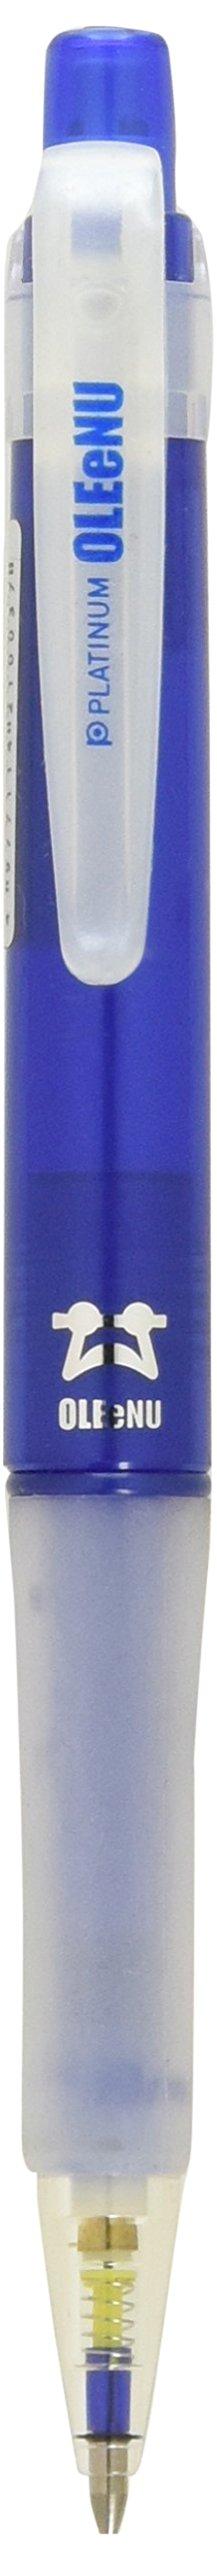 Platinum - Portaminas Oleenu, 0,5 mm, color azul